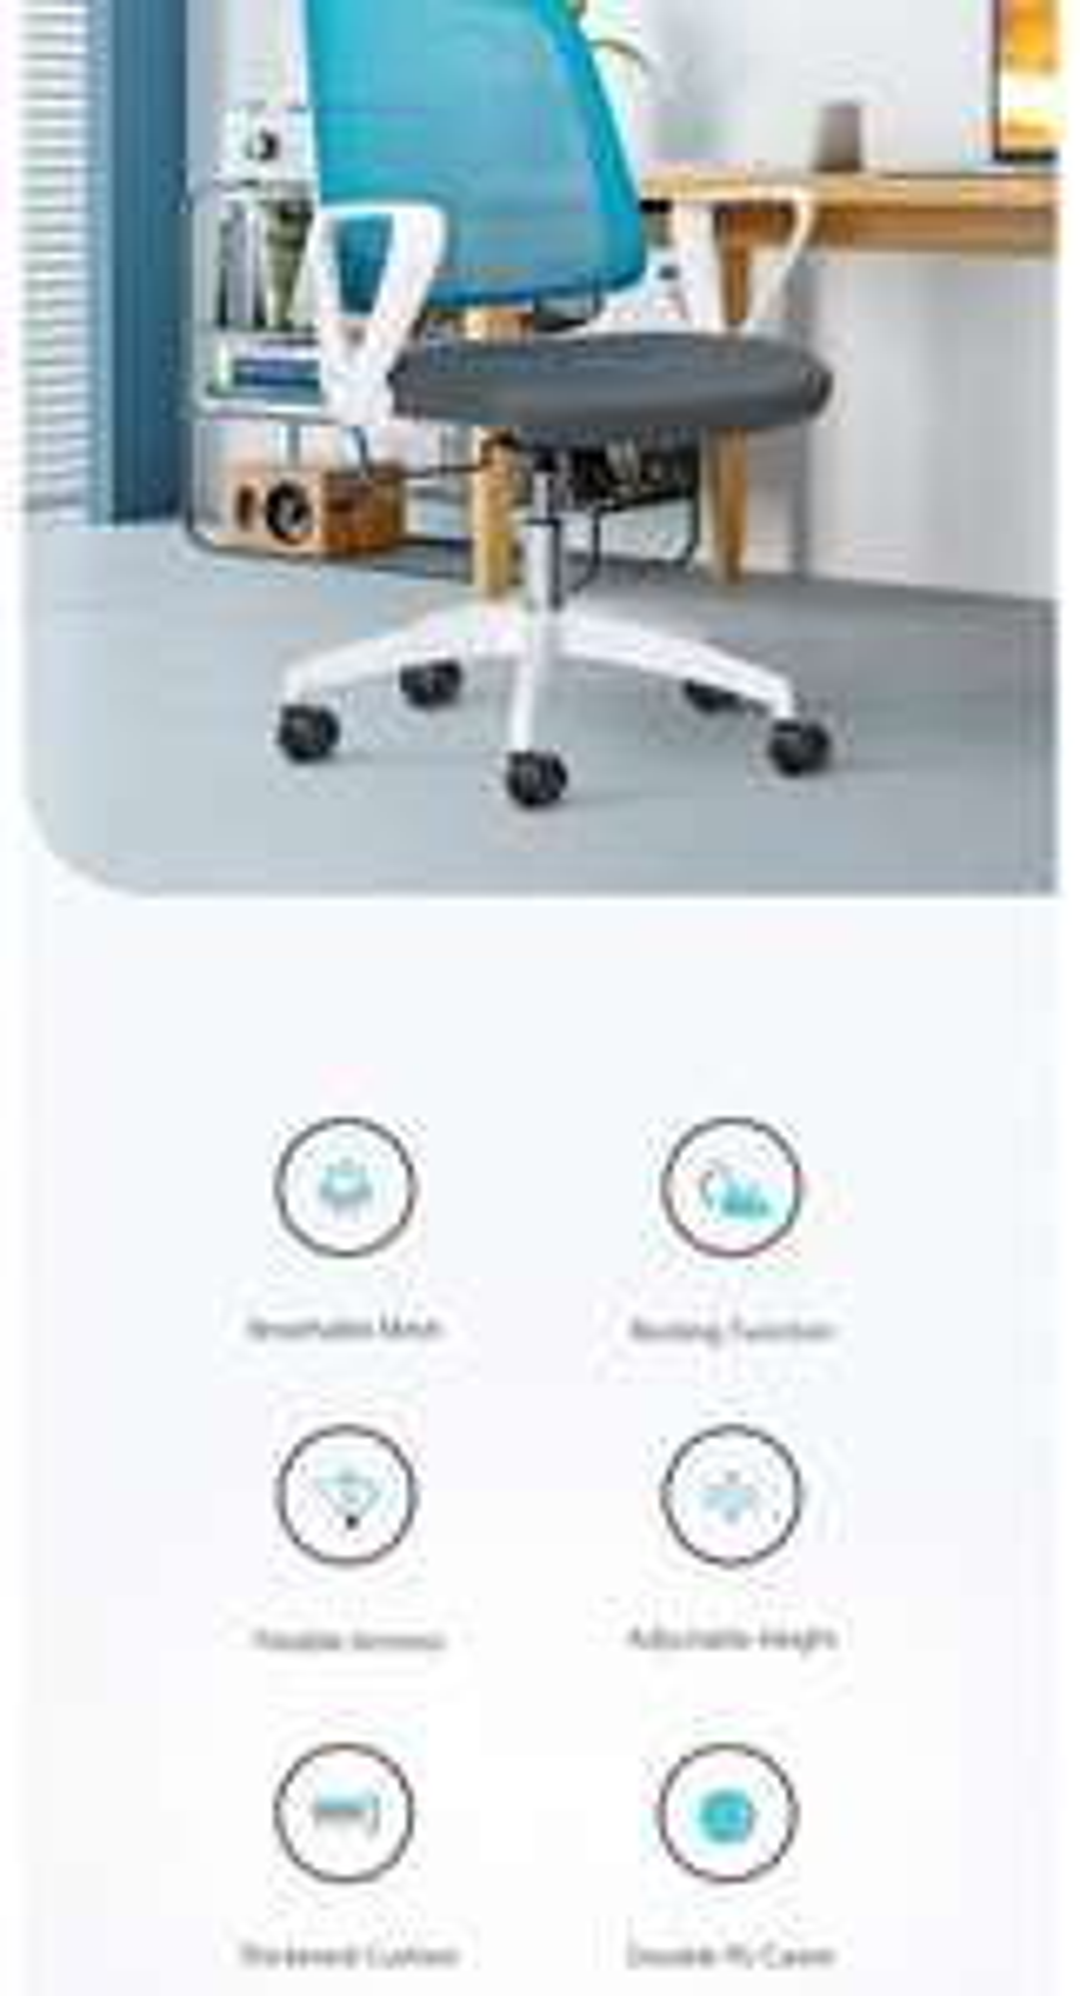 BlitzWolf® BW-HOC3 Office Mesh Chair Ergonomic Design Office Chair With Rocking Function & Flexible Armrest